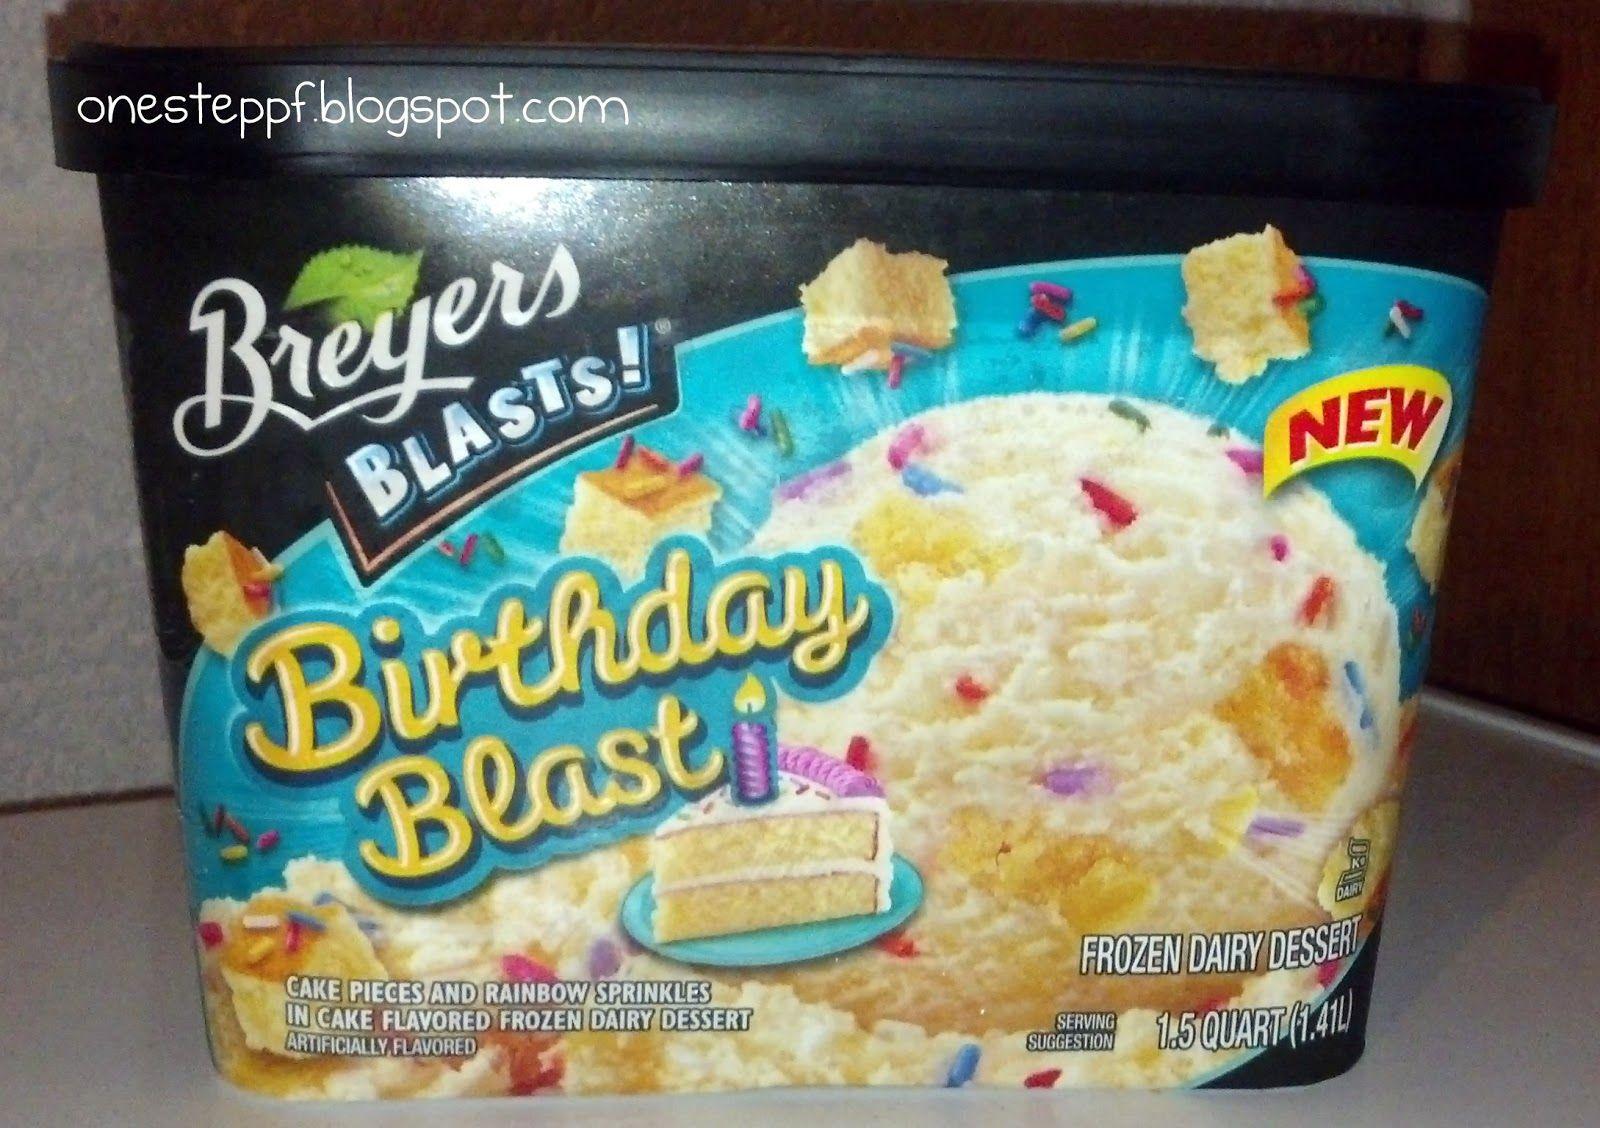 Astonishing Breyers Birthday Blast Ice Cream Best Thing On This Planet Ice Funny Birthday Cards Online Alyptdamsfinfo